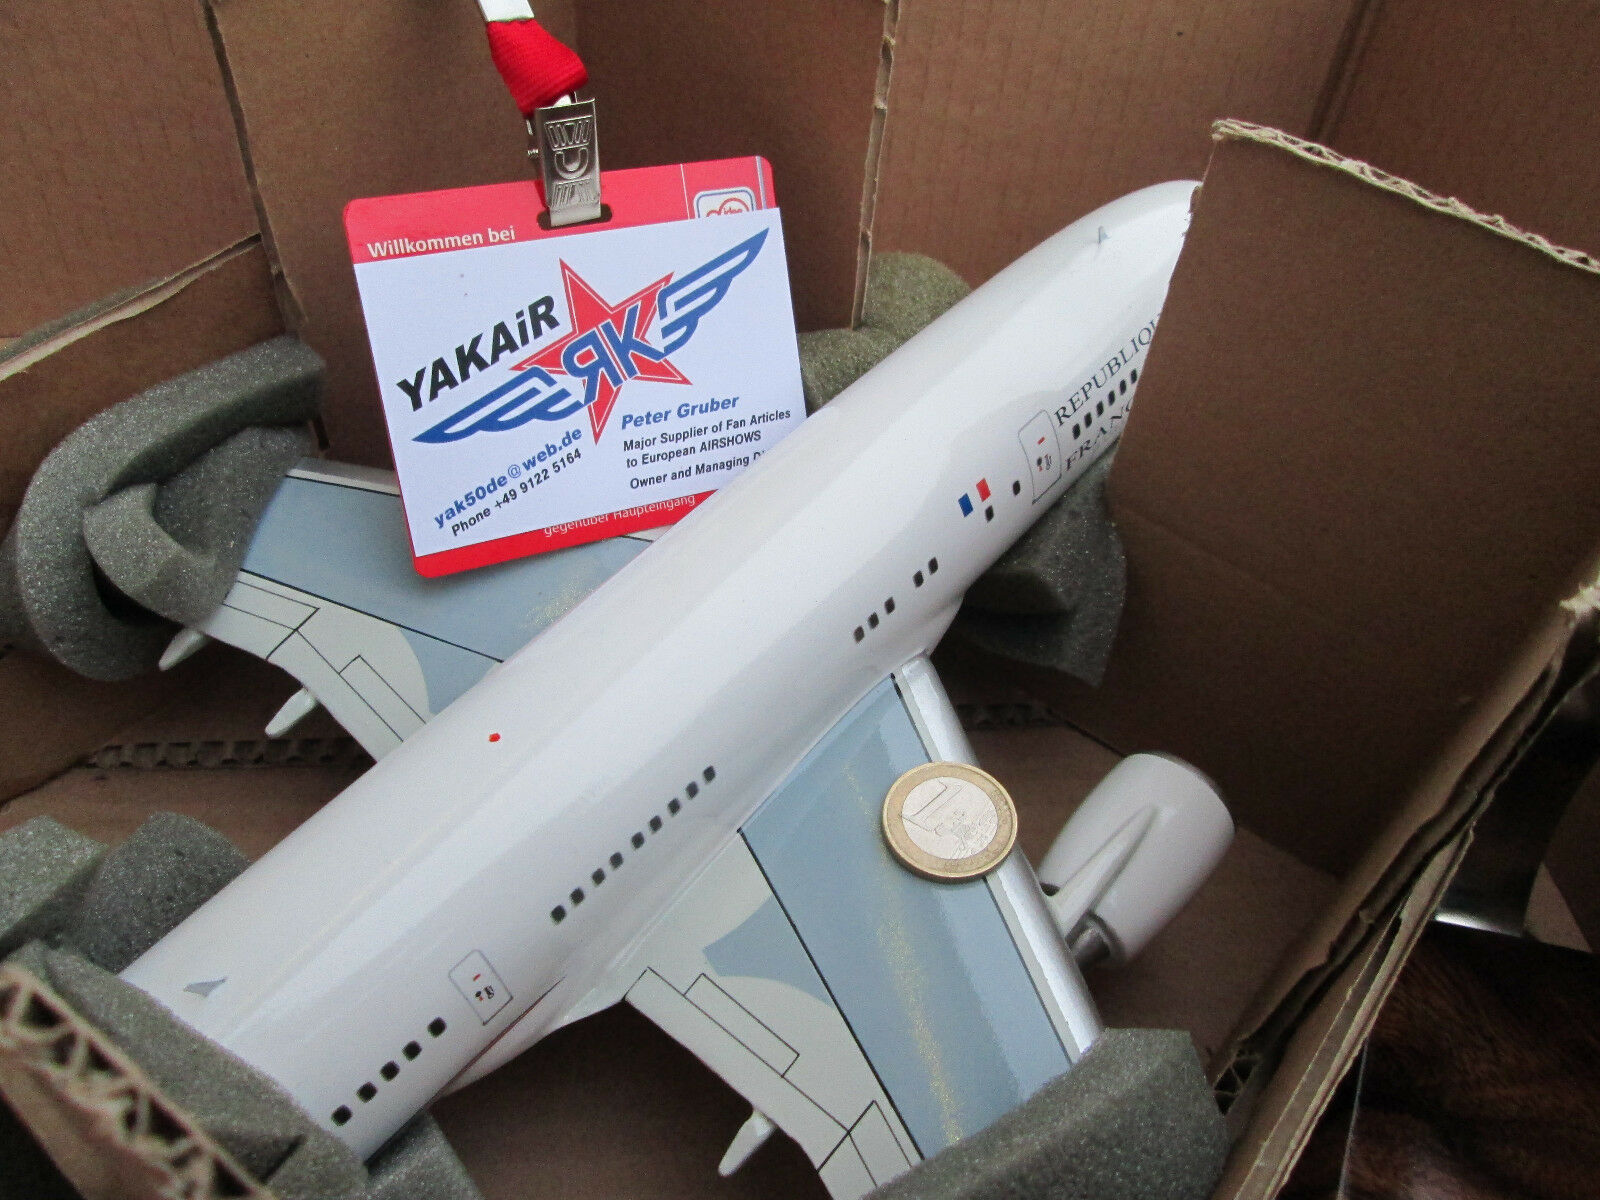 Airbus a330 223 F-RARF armée del Air ronds AIRCRAFT yakair wood model